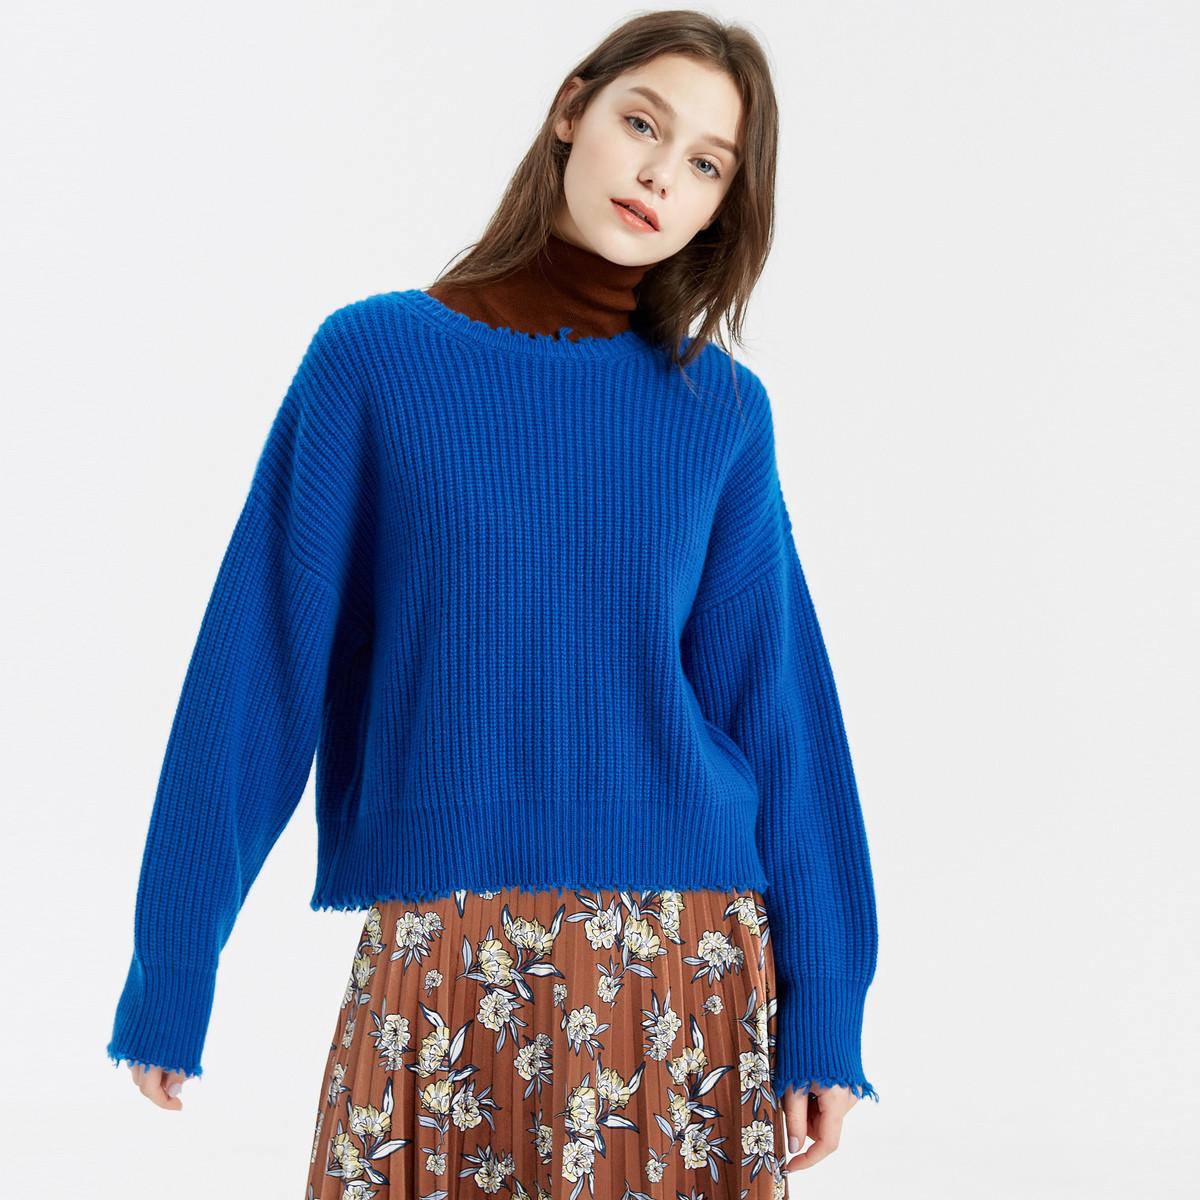 MECITY【本周新品】MECITY女装2018冬季新款女式短款剪口毛衣51996140